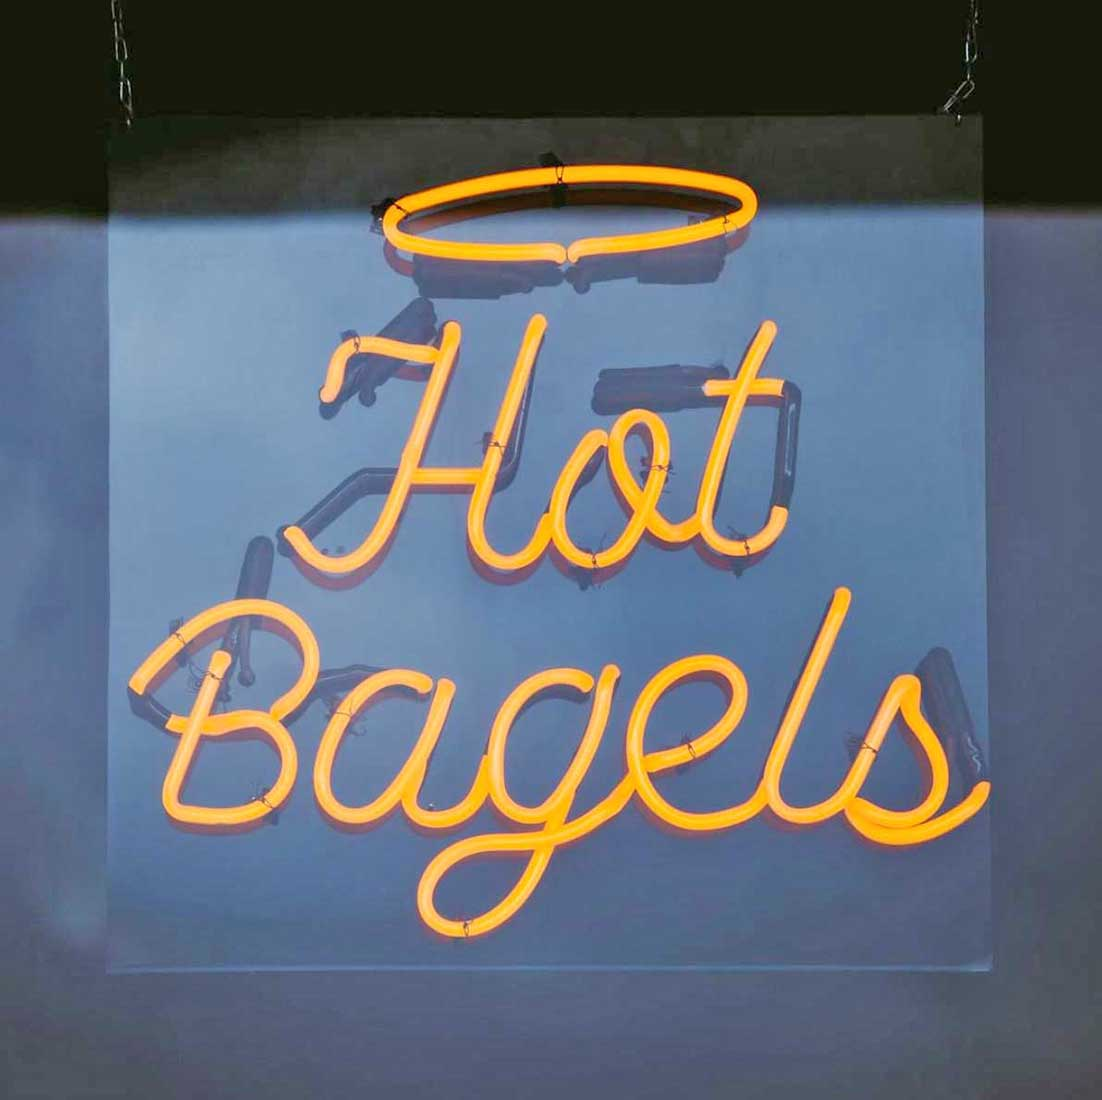 Great Bagel & Bakery Woodland. Neon sign, Hot Bagels!